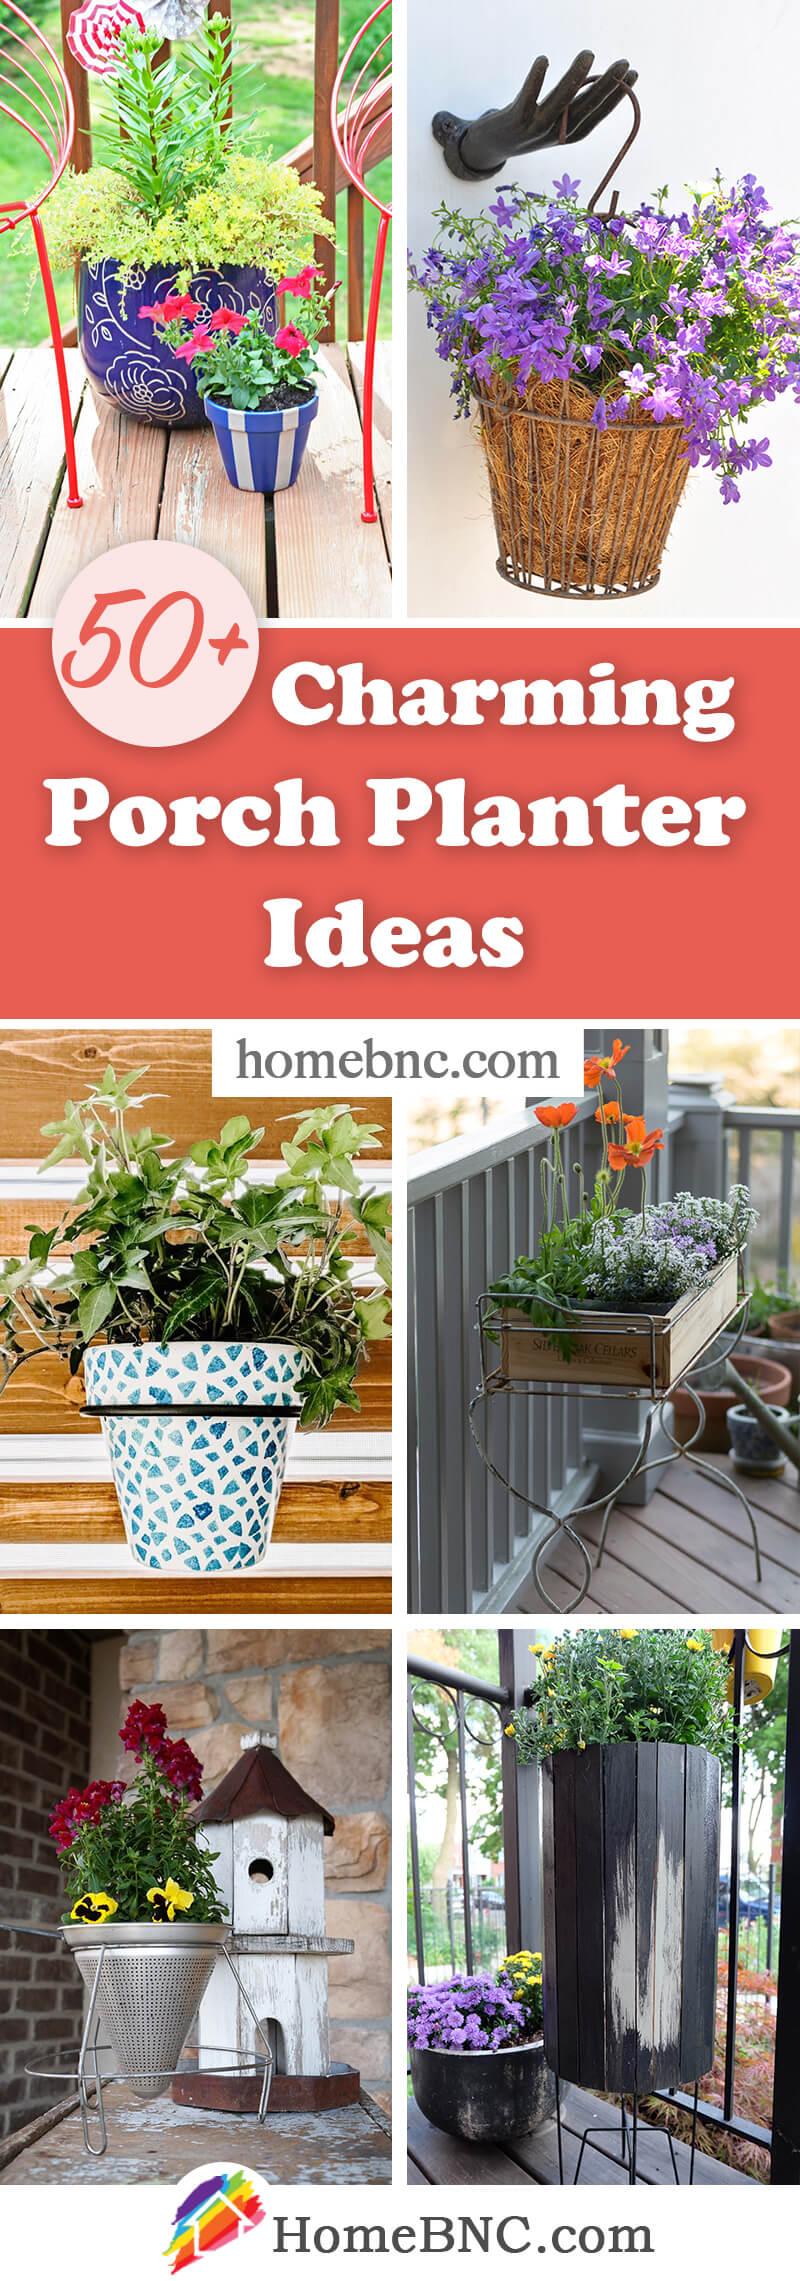 Porch Planter Designs